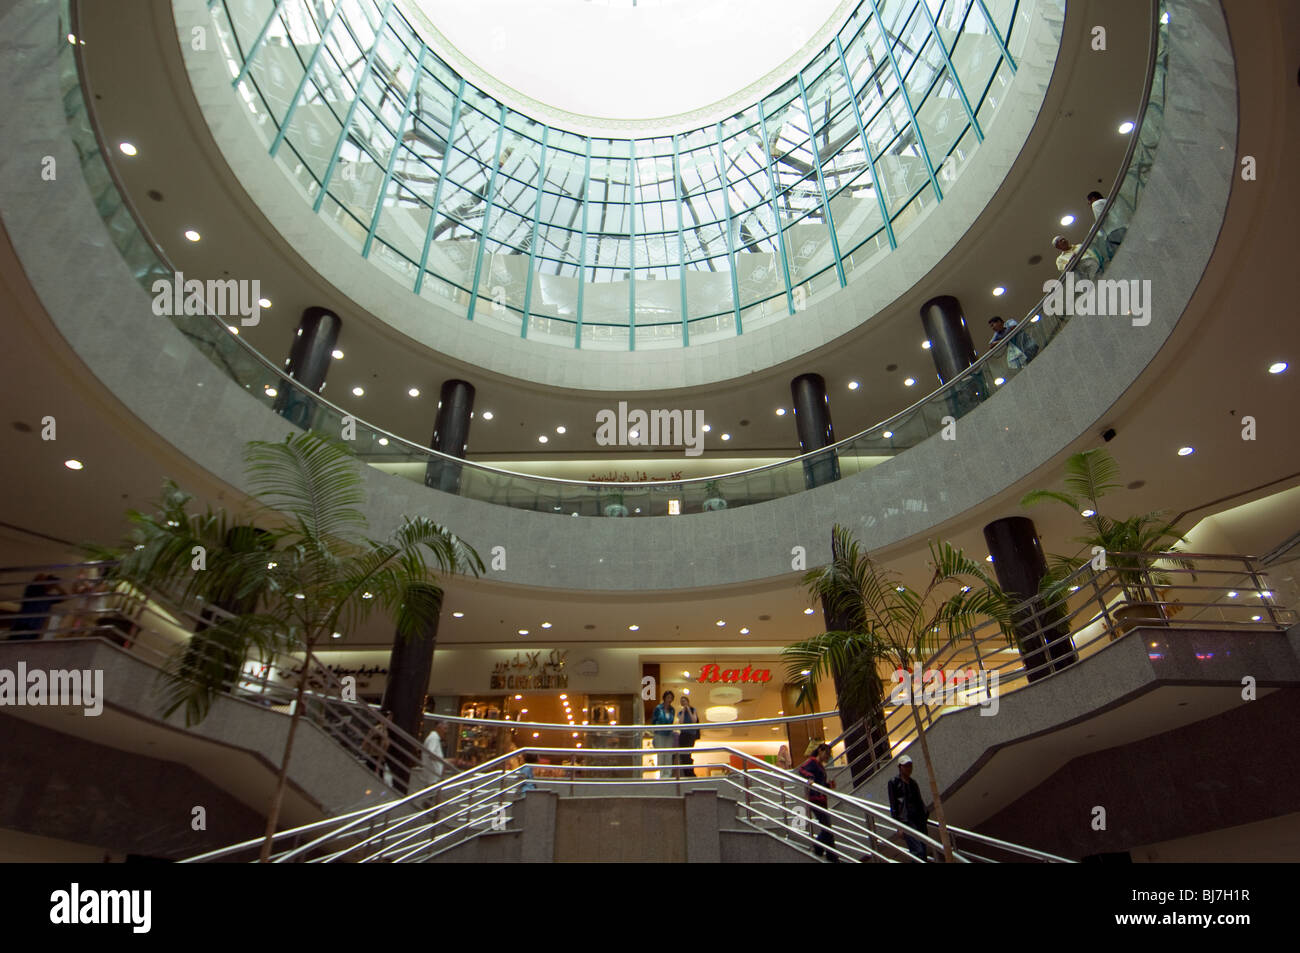 Shopping centre, Bandar Seri Begawan, Brunei Darussalam - Stock Image